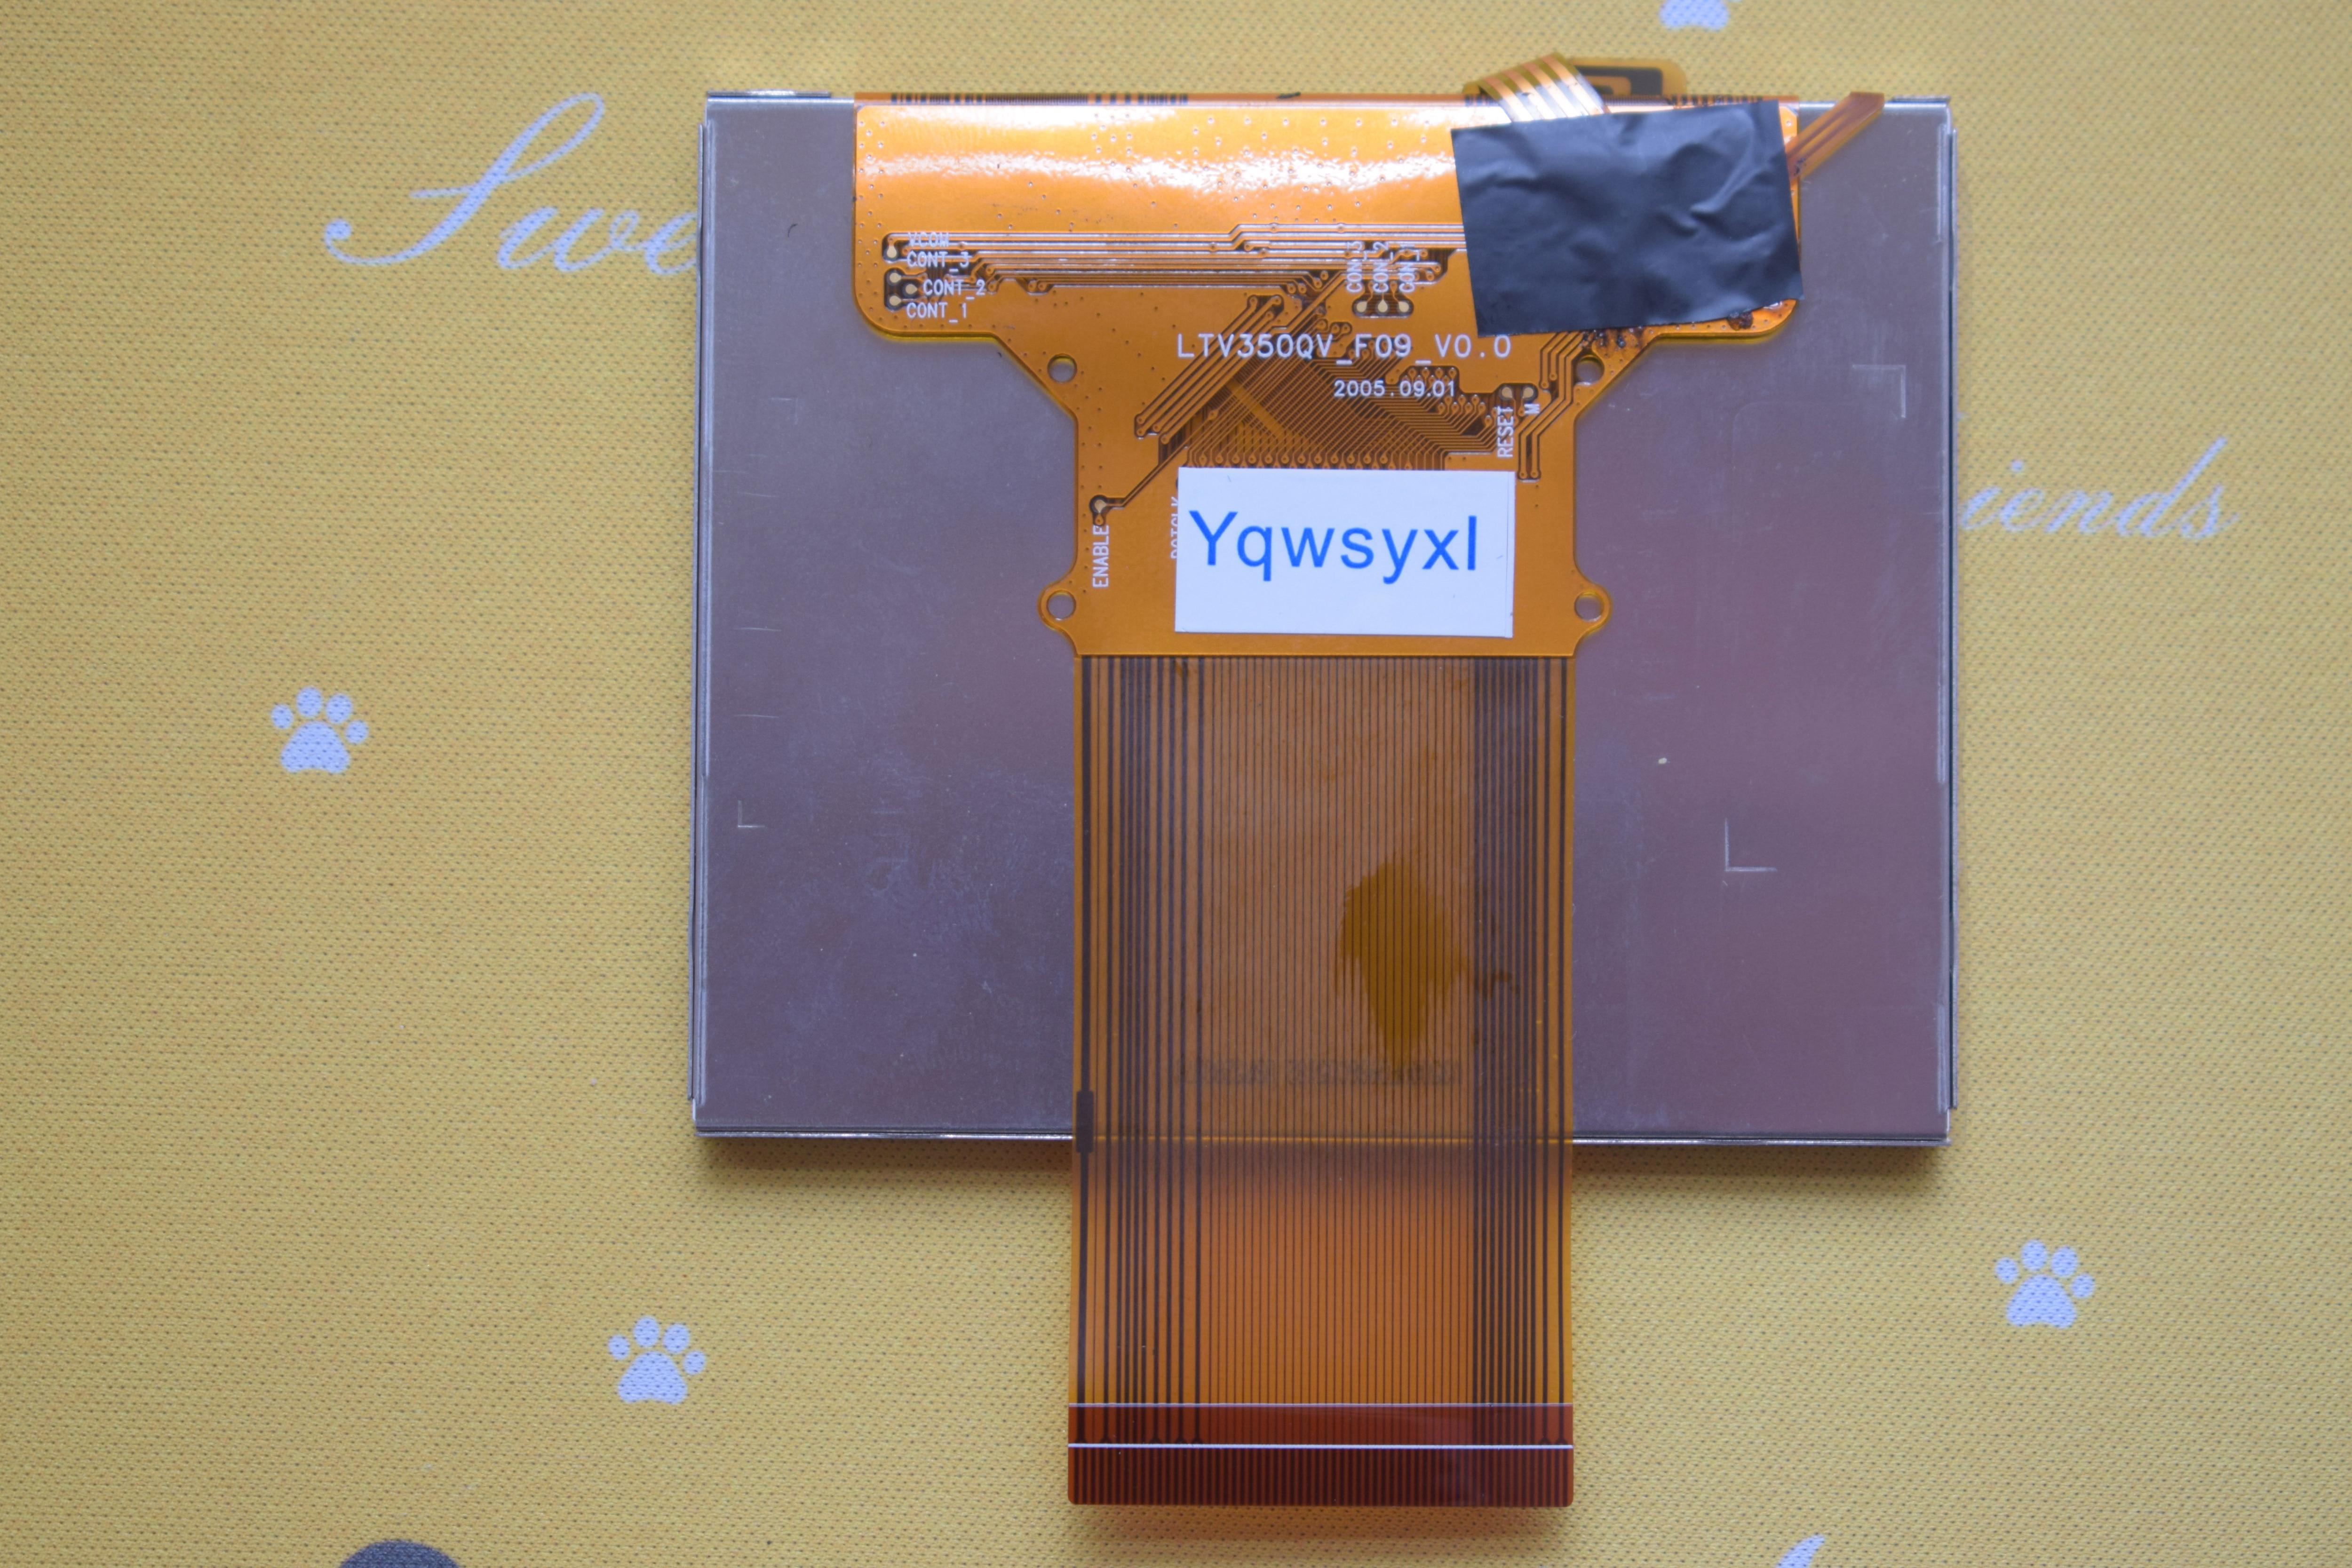 Yqwsyxl Original New 3.5 Inch LTV350QV-F06 LTV350QV-F09 LCD Scren Display Digitizer For Saeco Primea Touch Plus GPS PND Panel